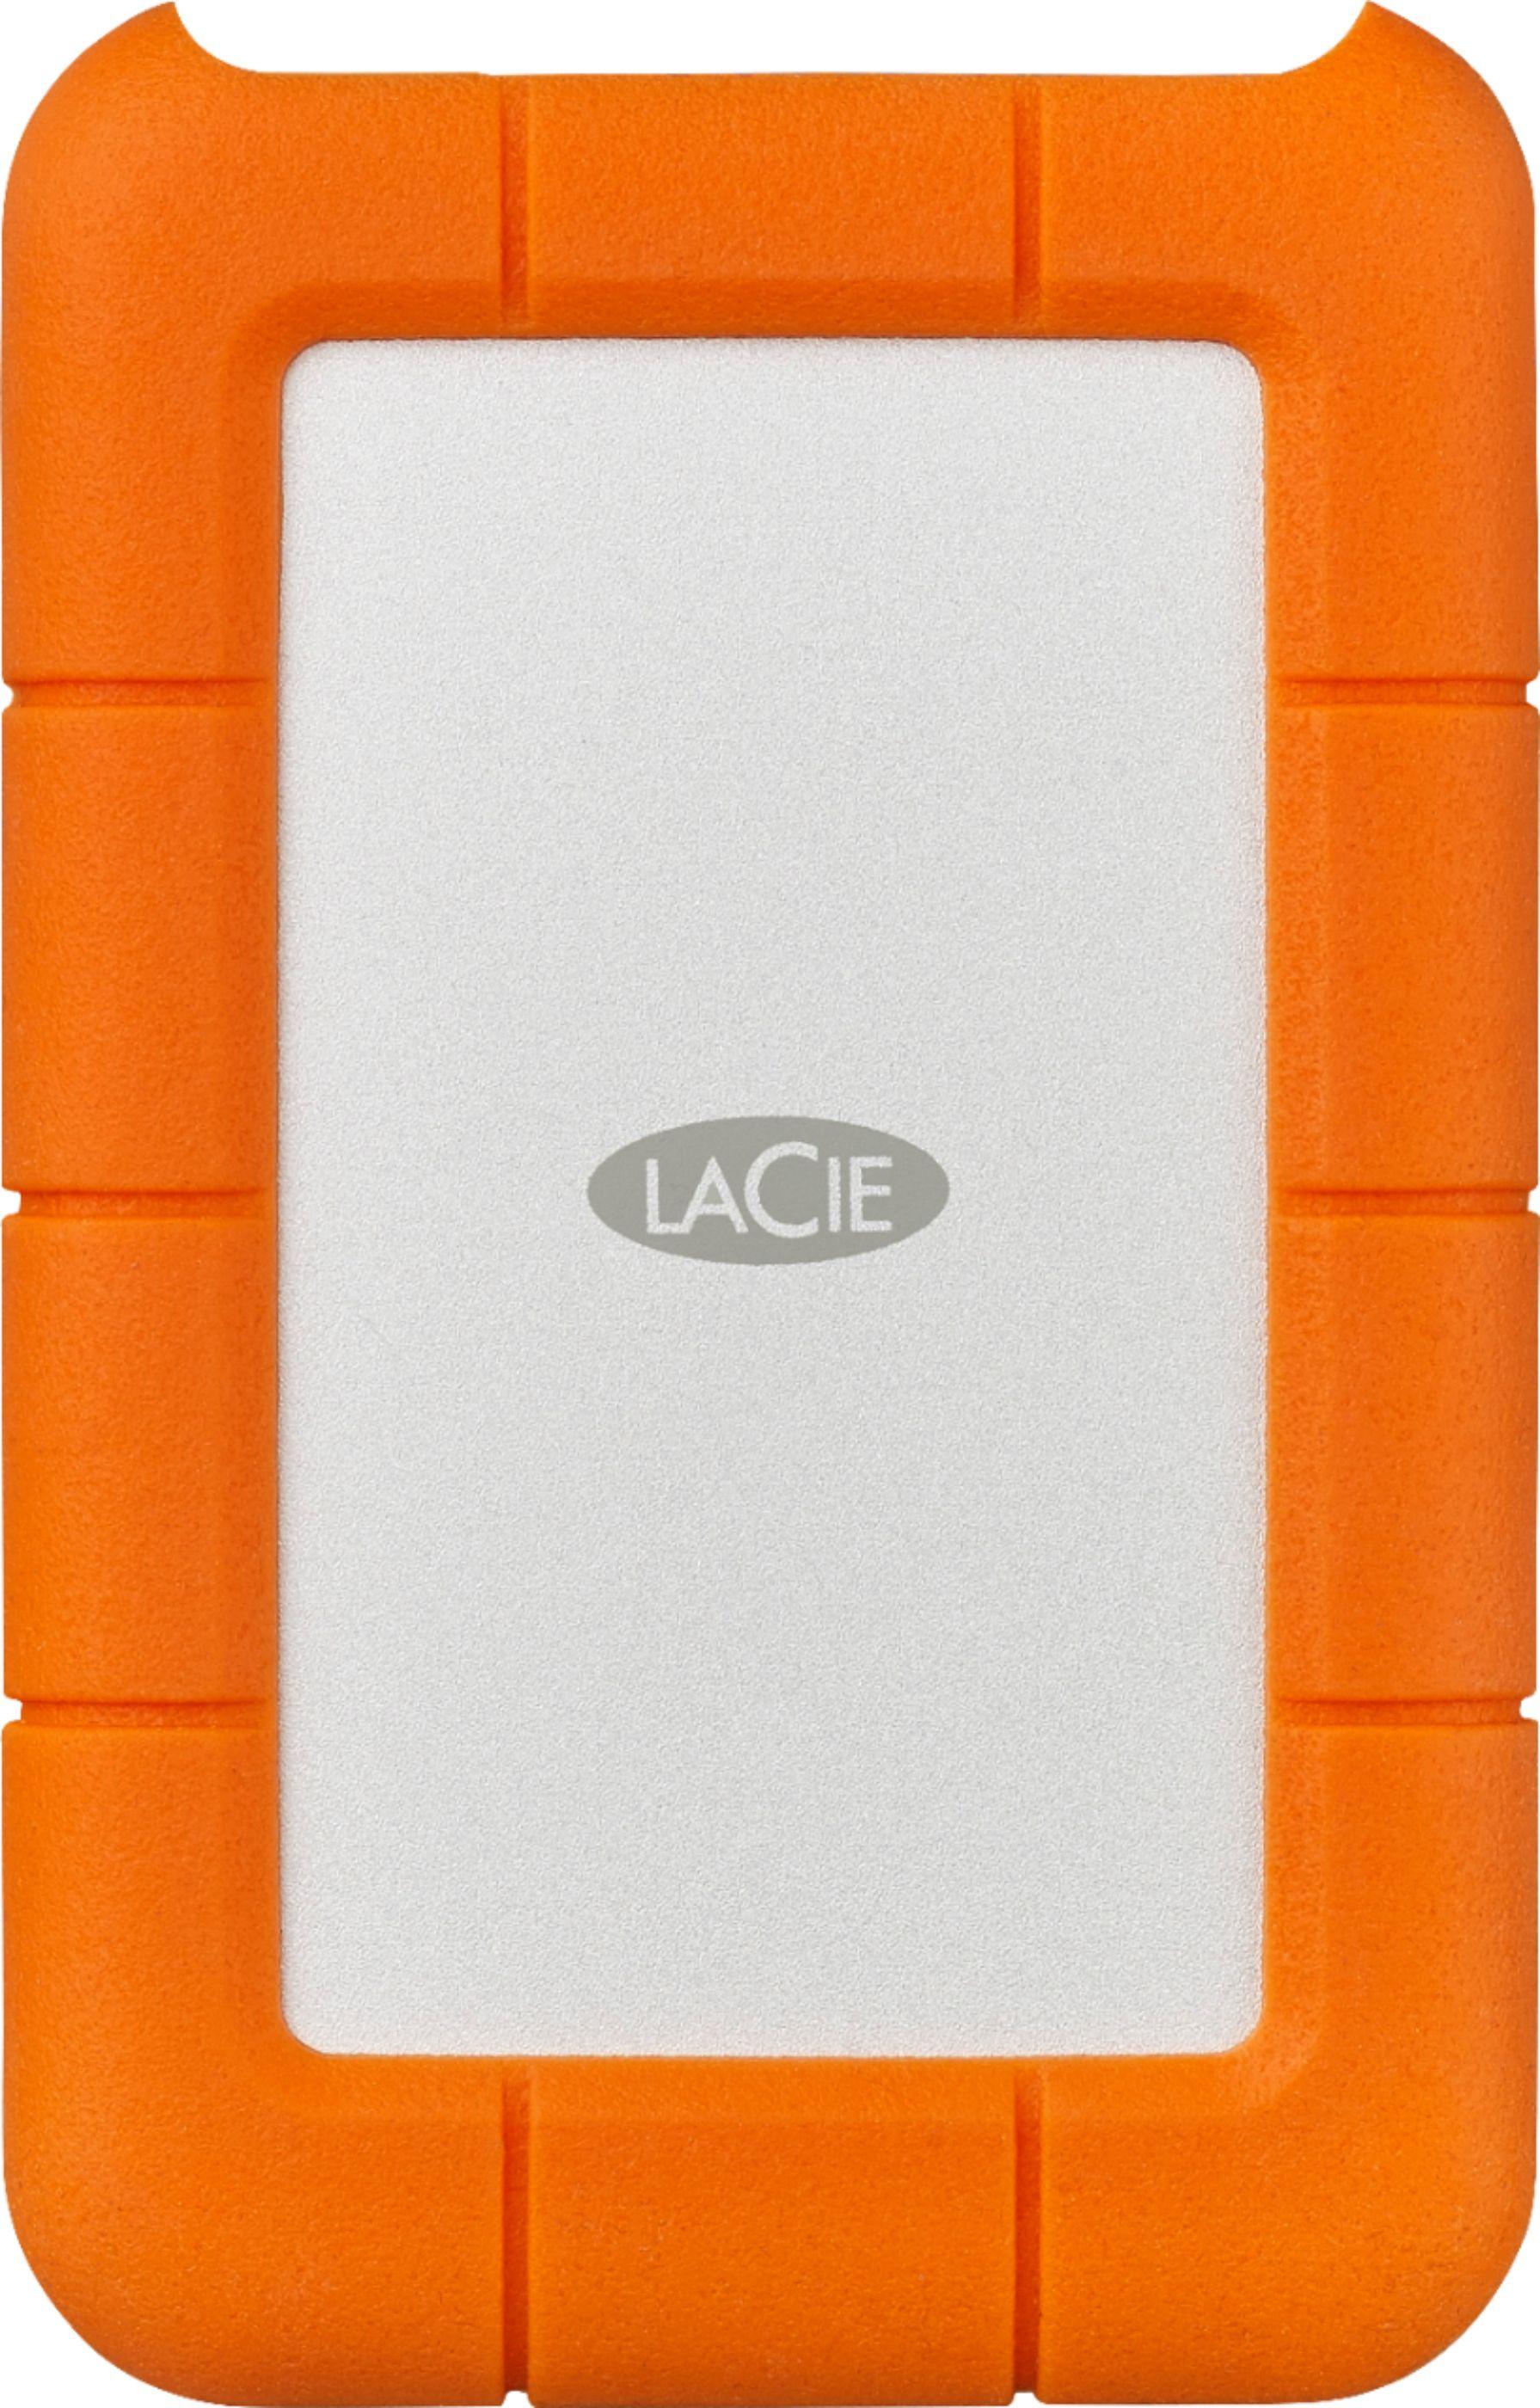 LaCie Rugged USB-C 2TB External USB 3.1 Gen1 Portable Hard Drive Orange STFR2000400